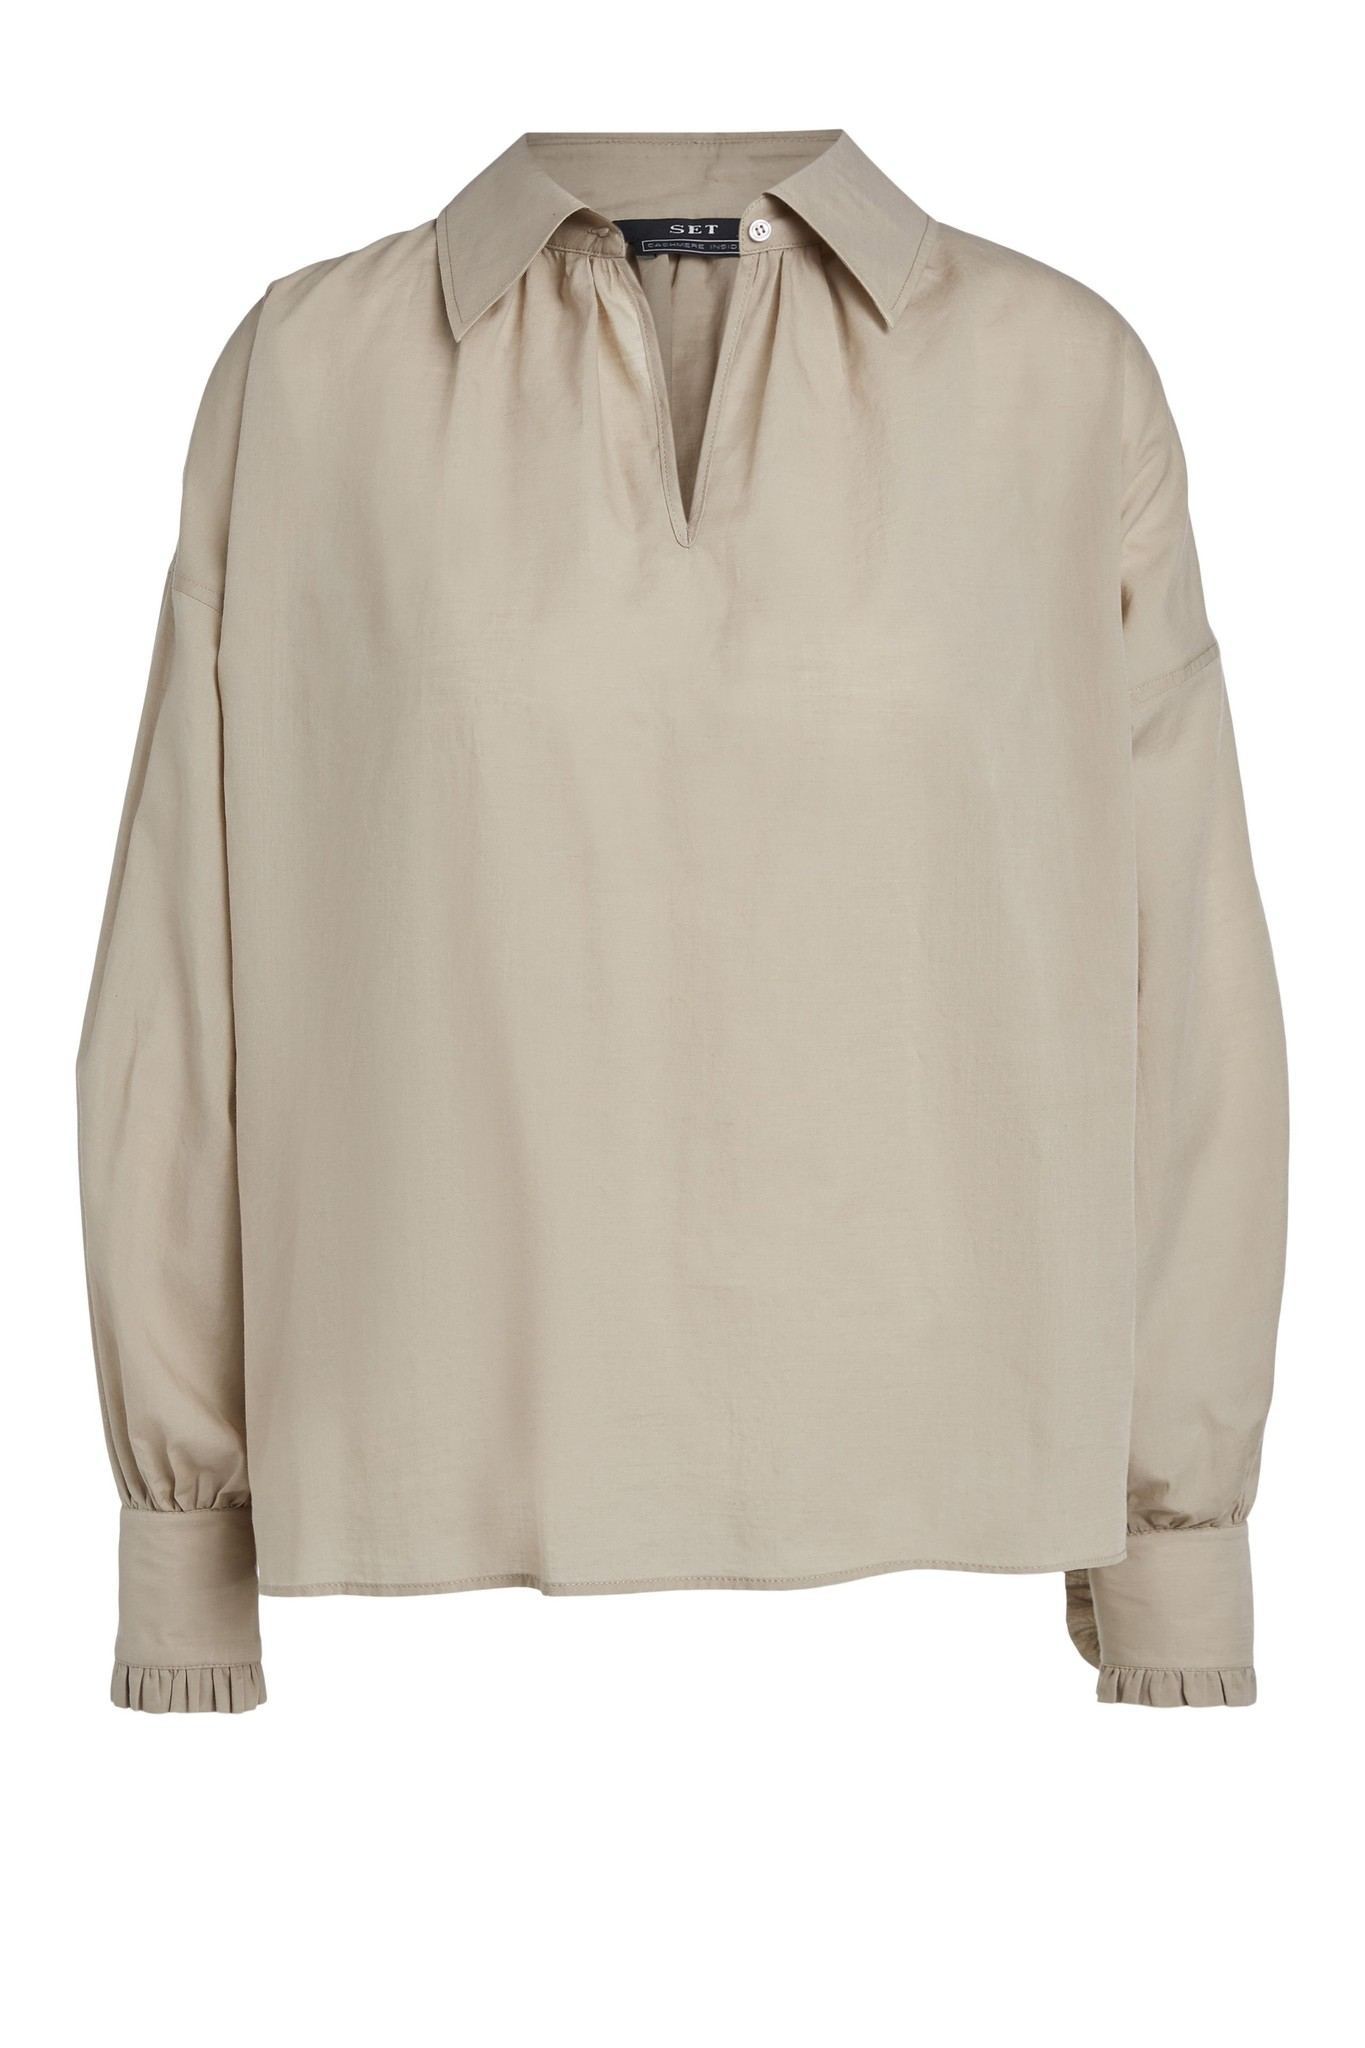 SET blouse 73967 7346-1